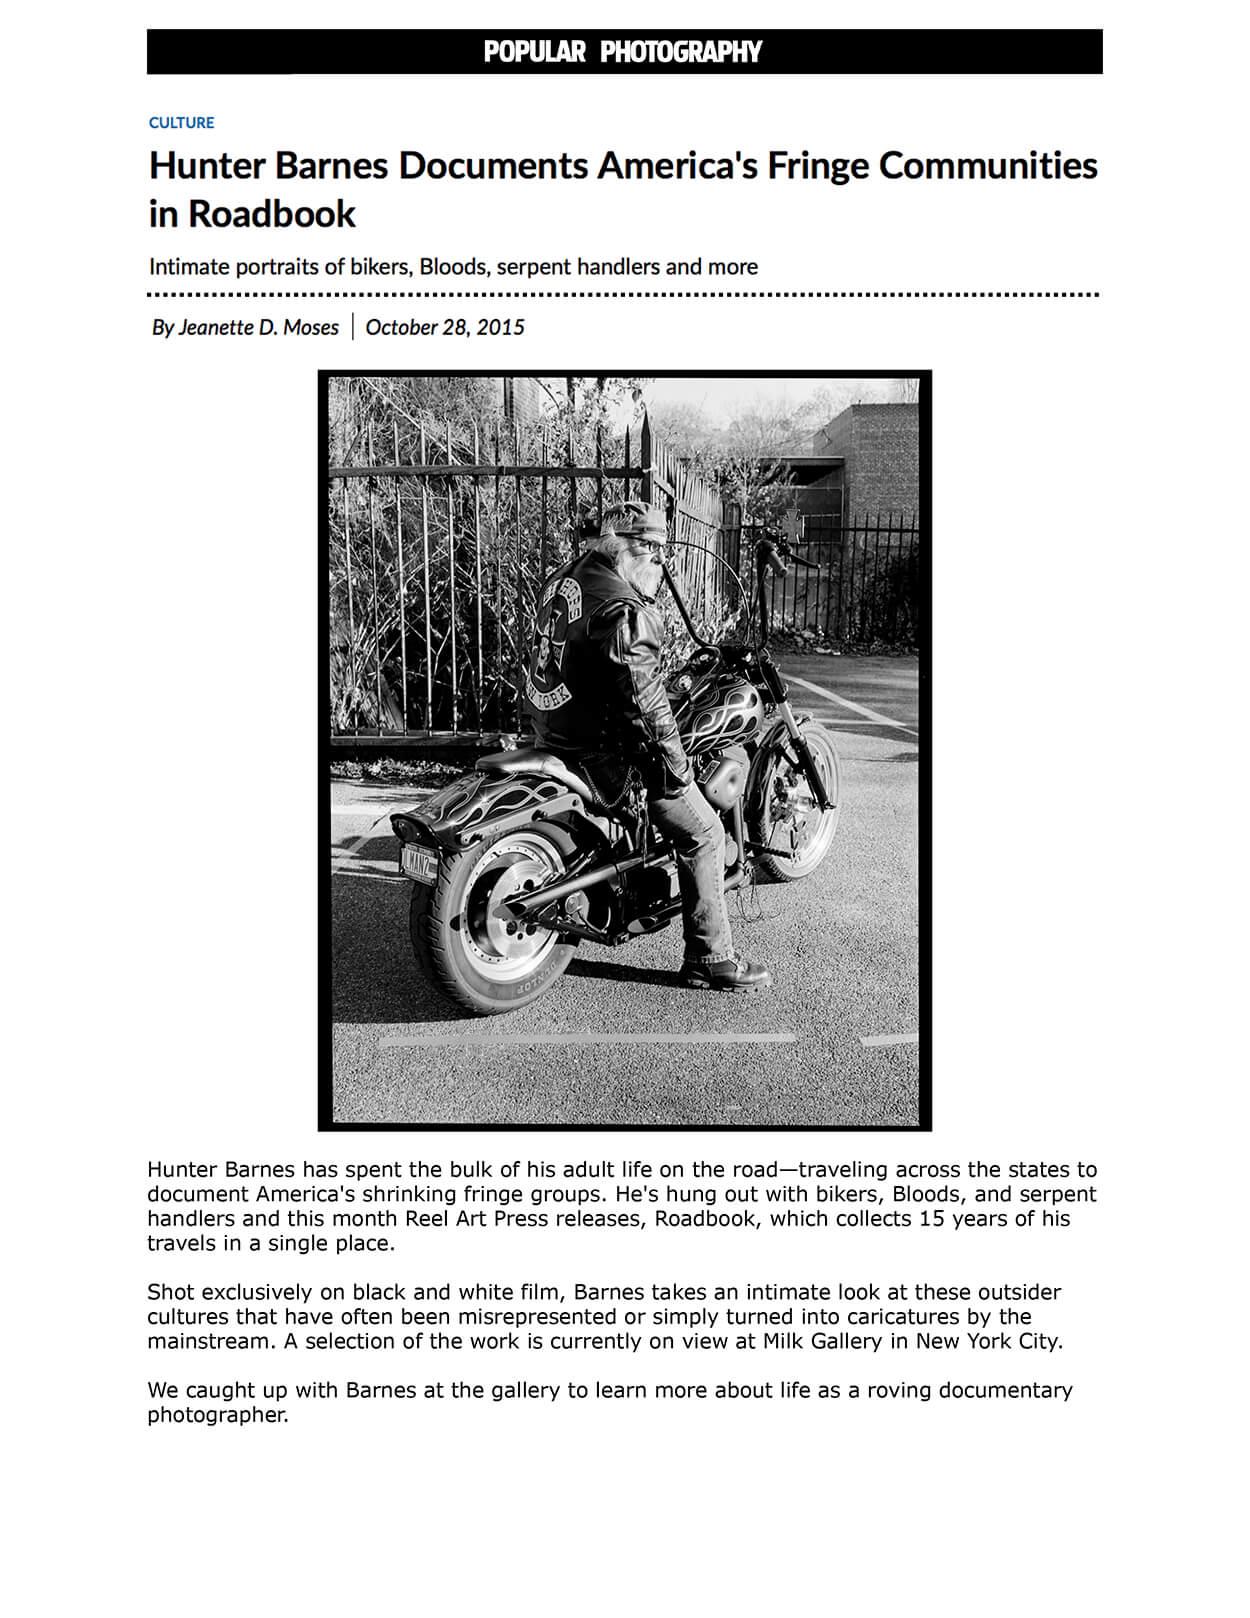 Hunter Barnes documents America's fringe communities in Roadbook - Popular Photography - Popular Photography - Page 1